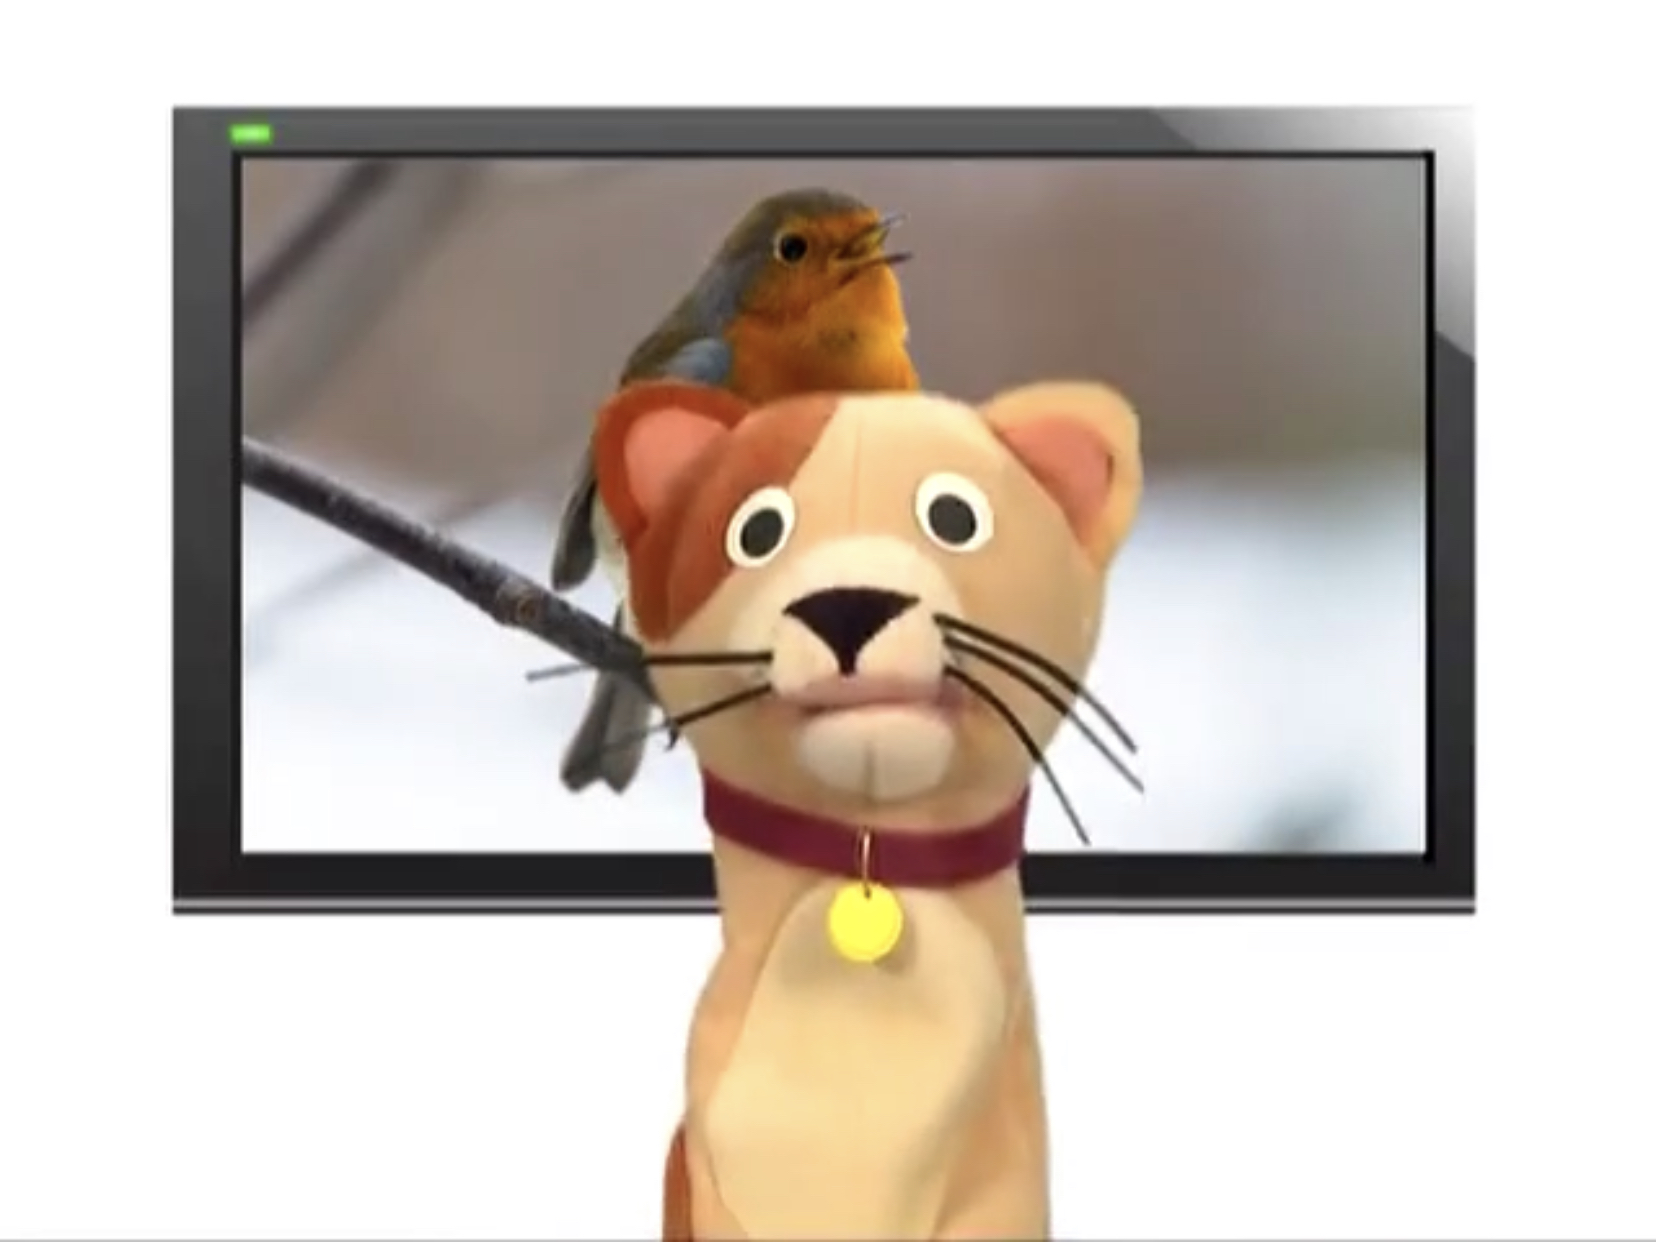 Sound Ideas, BIRD, BLUEBIRD - BLUEBIRDS CHIRPING, ANIMAL